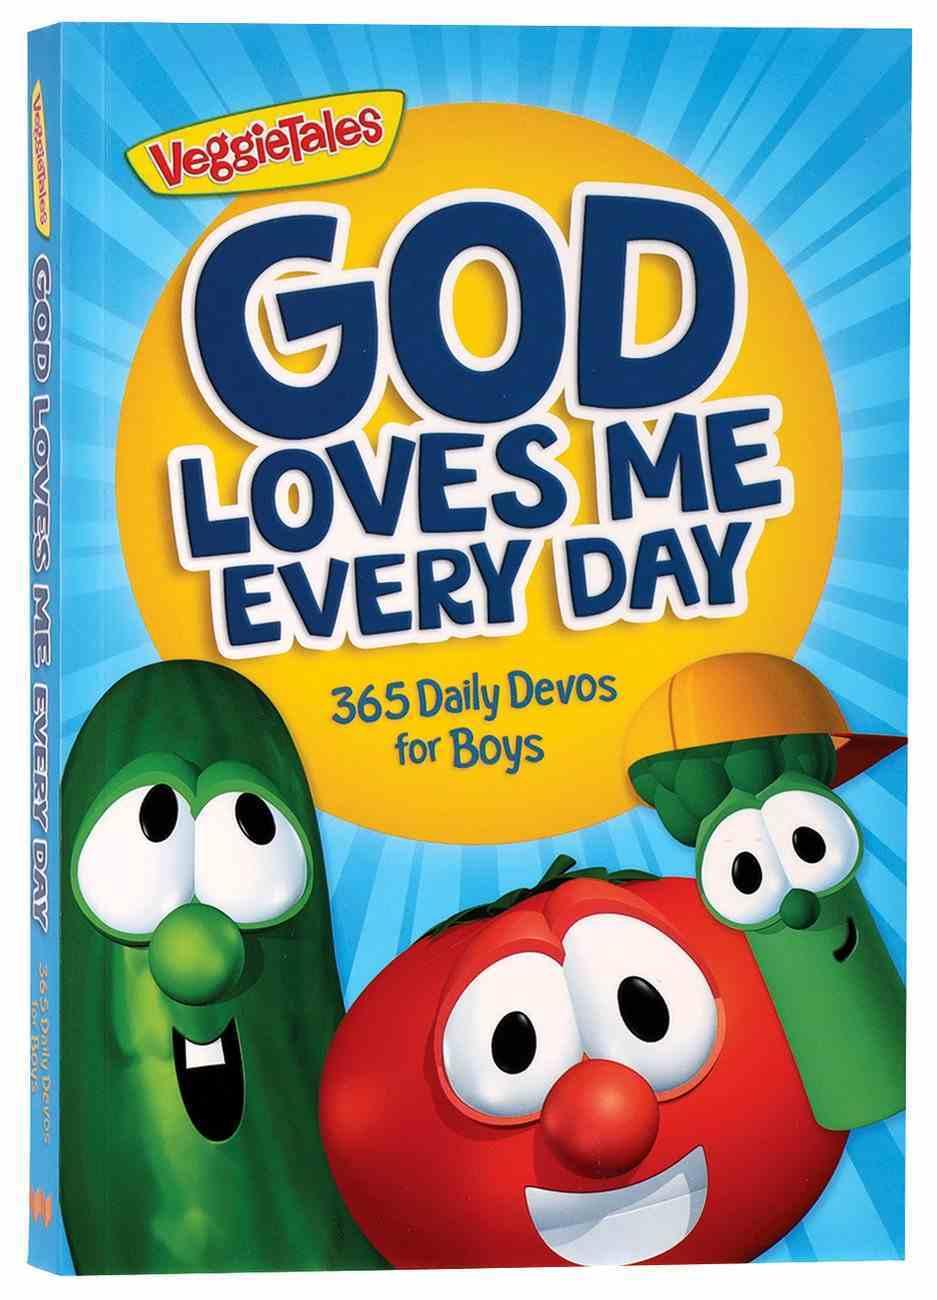 God Loves Me Every Day: 365 Daily Devos For Boys (Veggie Tales (Veggietales) Series) Paperback